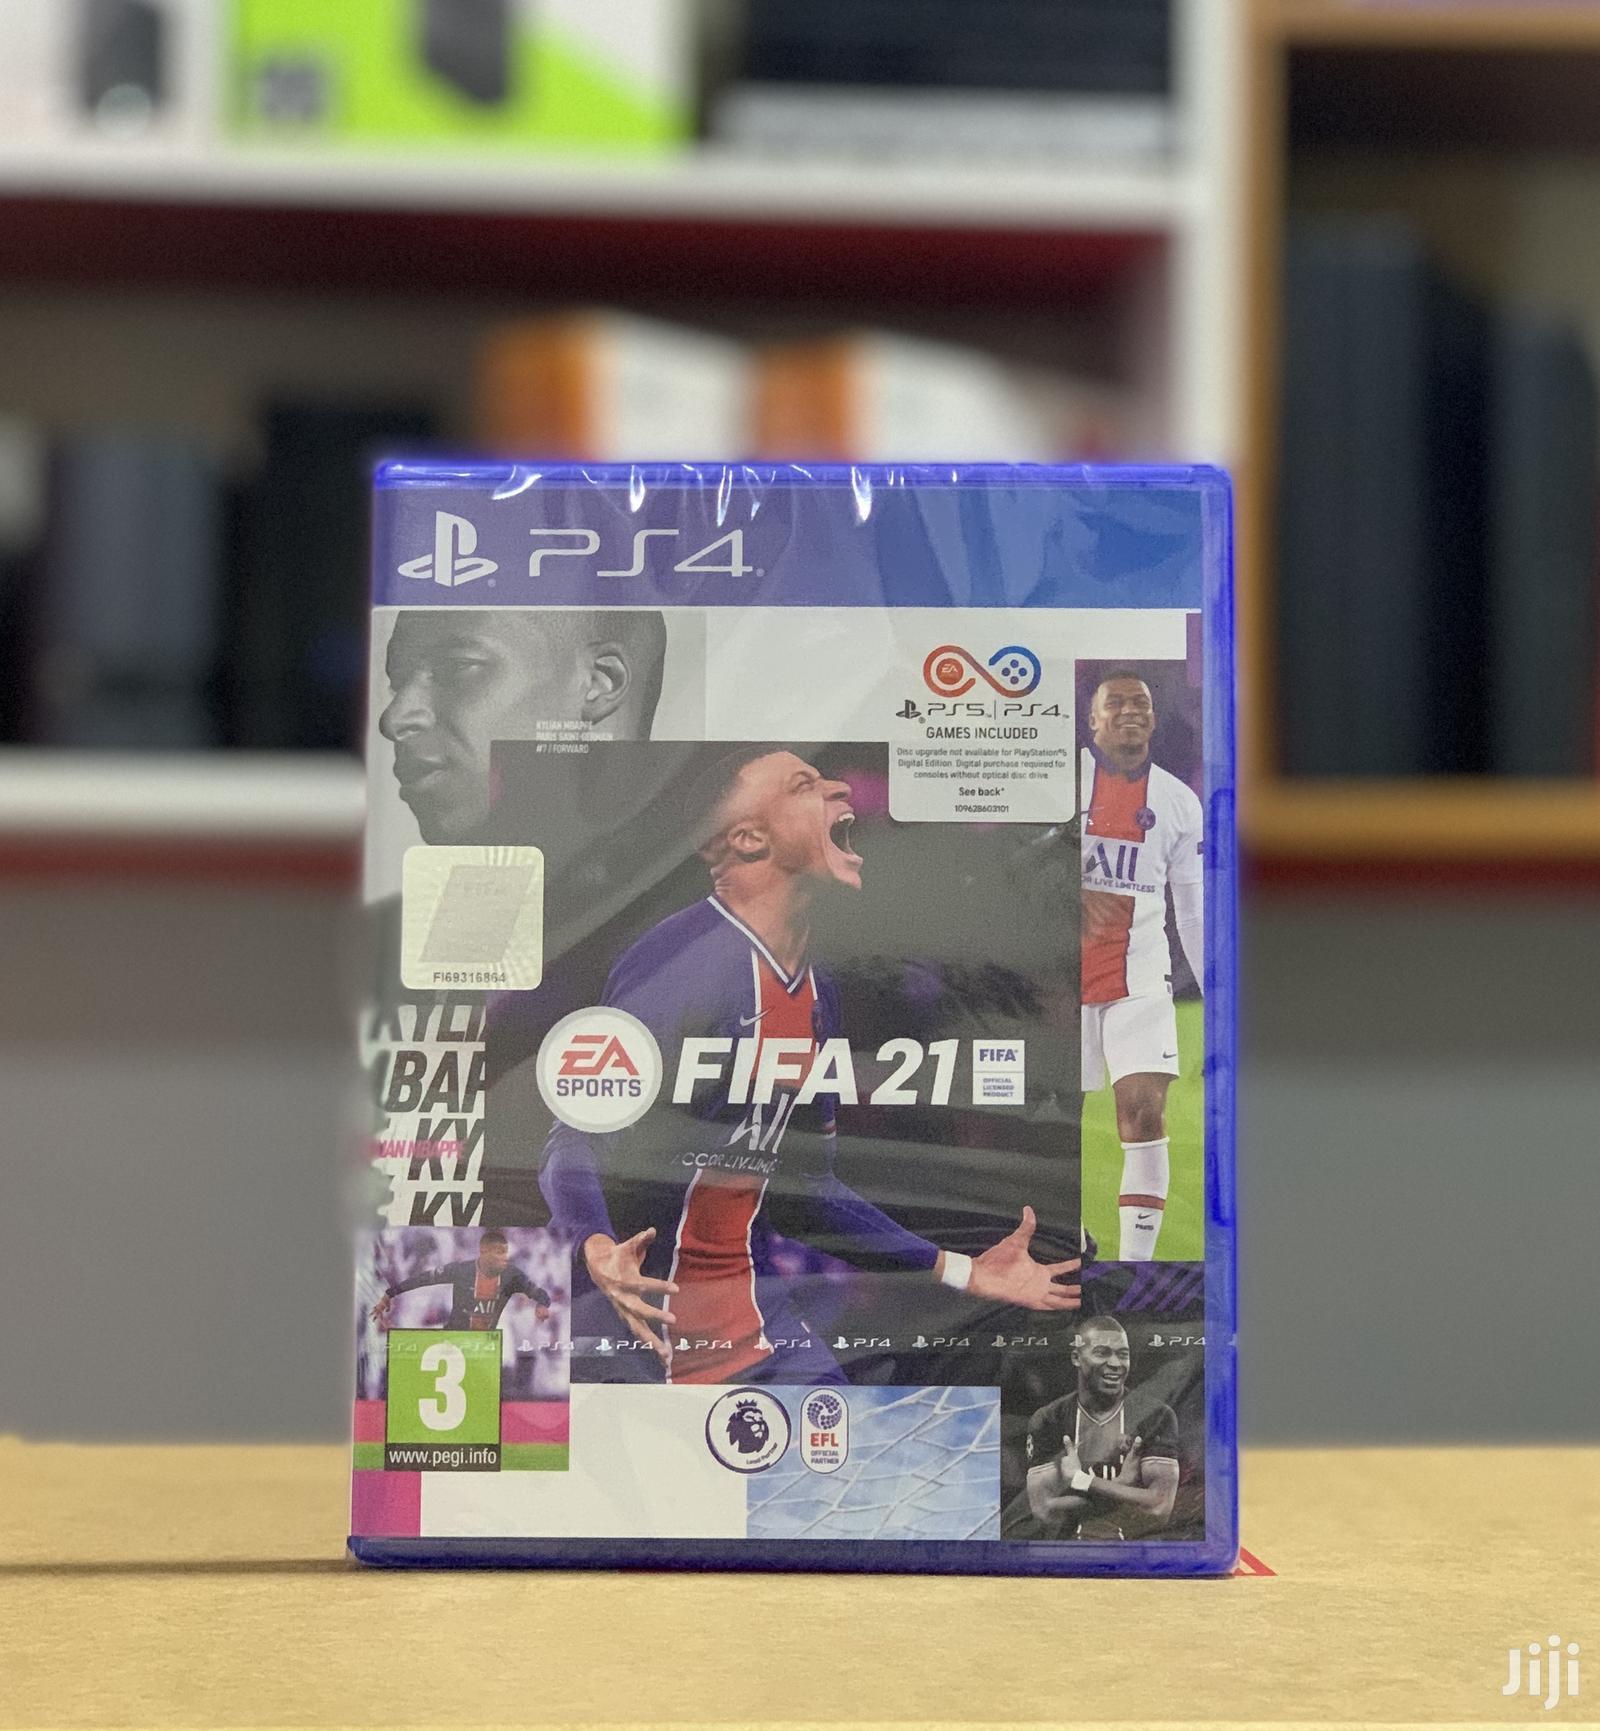 Fifa 21 PS4 Game | Video Games for sale in Kampala, Central Region, Uganda